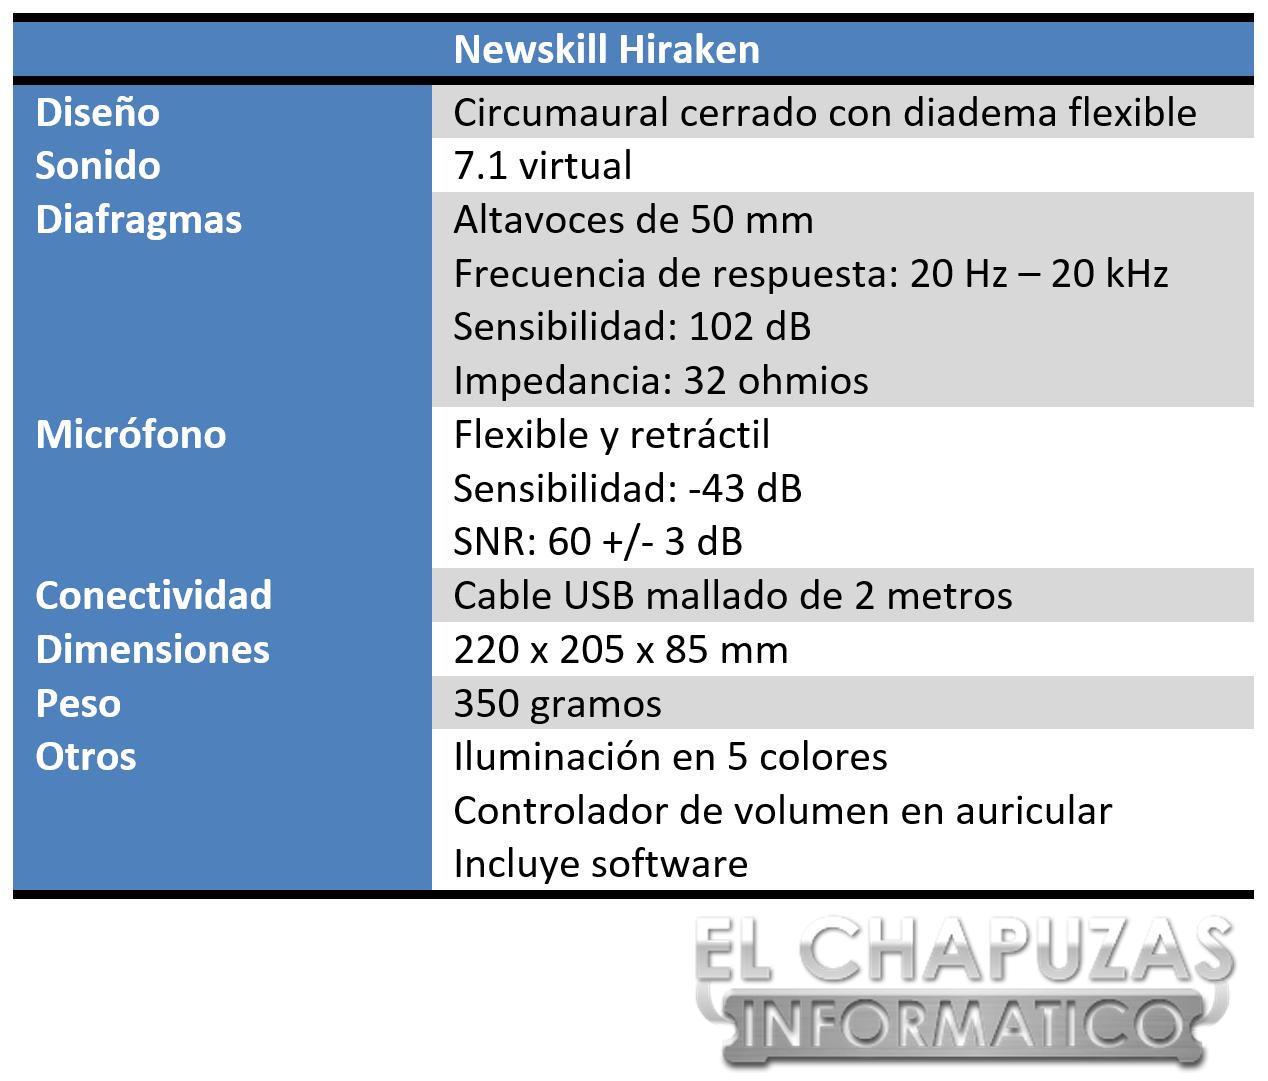 Newskill Hiraken Especificaciones